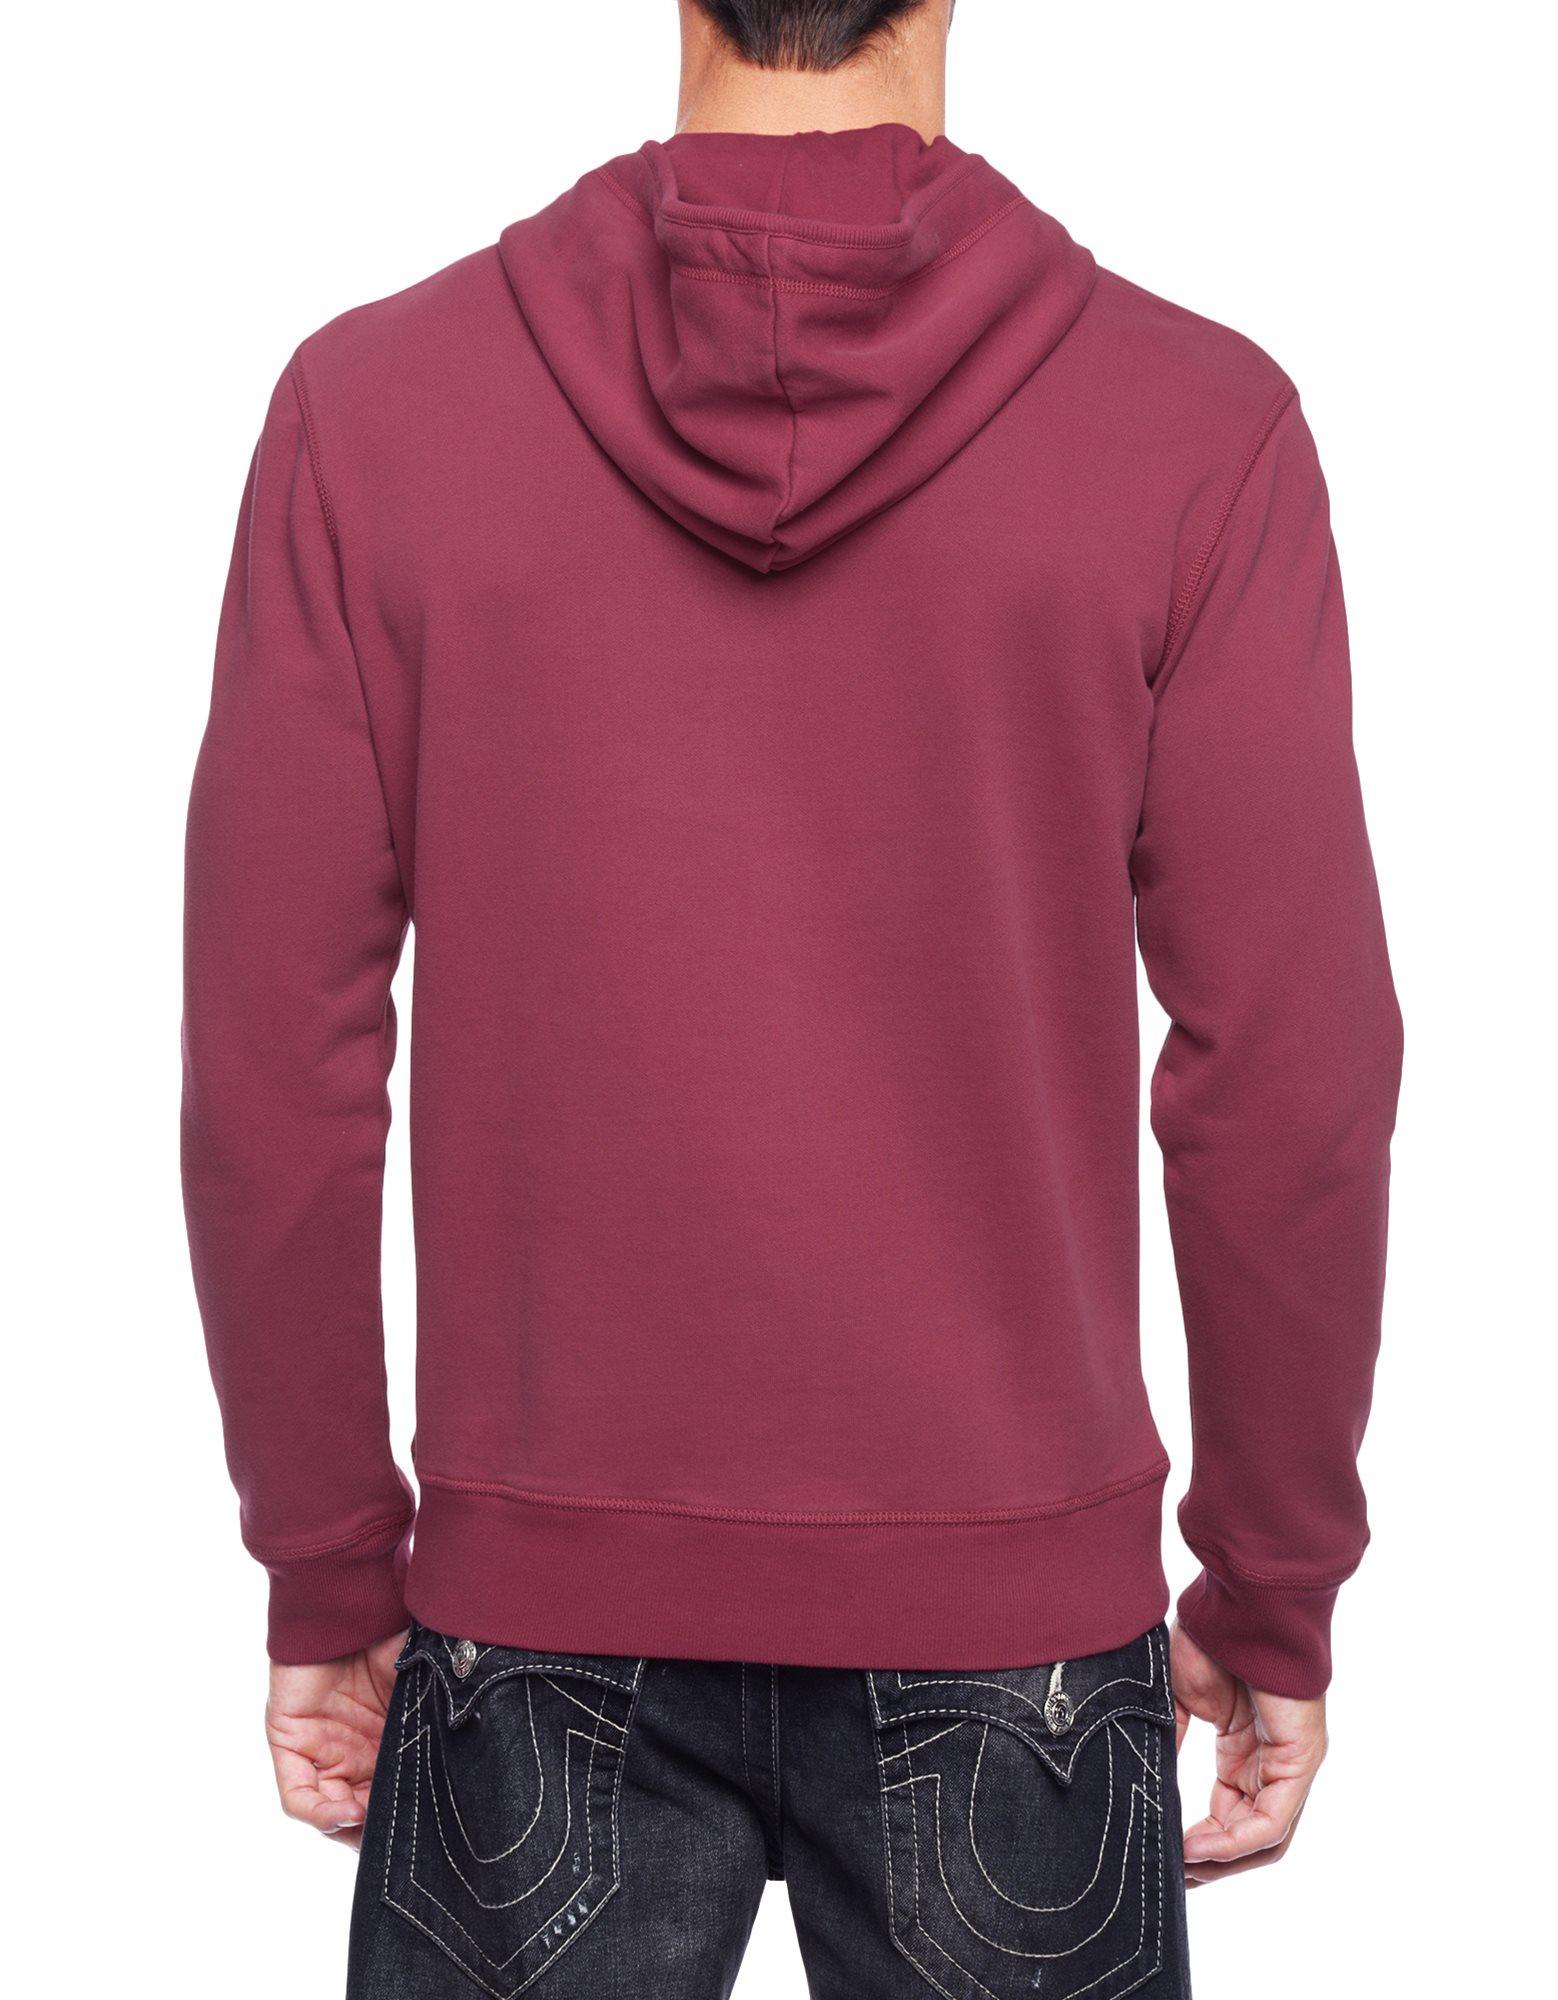 true religion fleece mens hoodie in red for men lyst. Black Bedroom Furniture Sets. Home Design Ideas